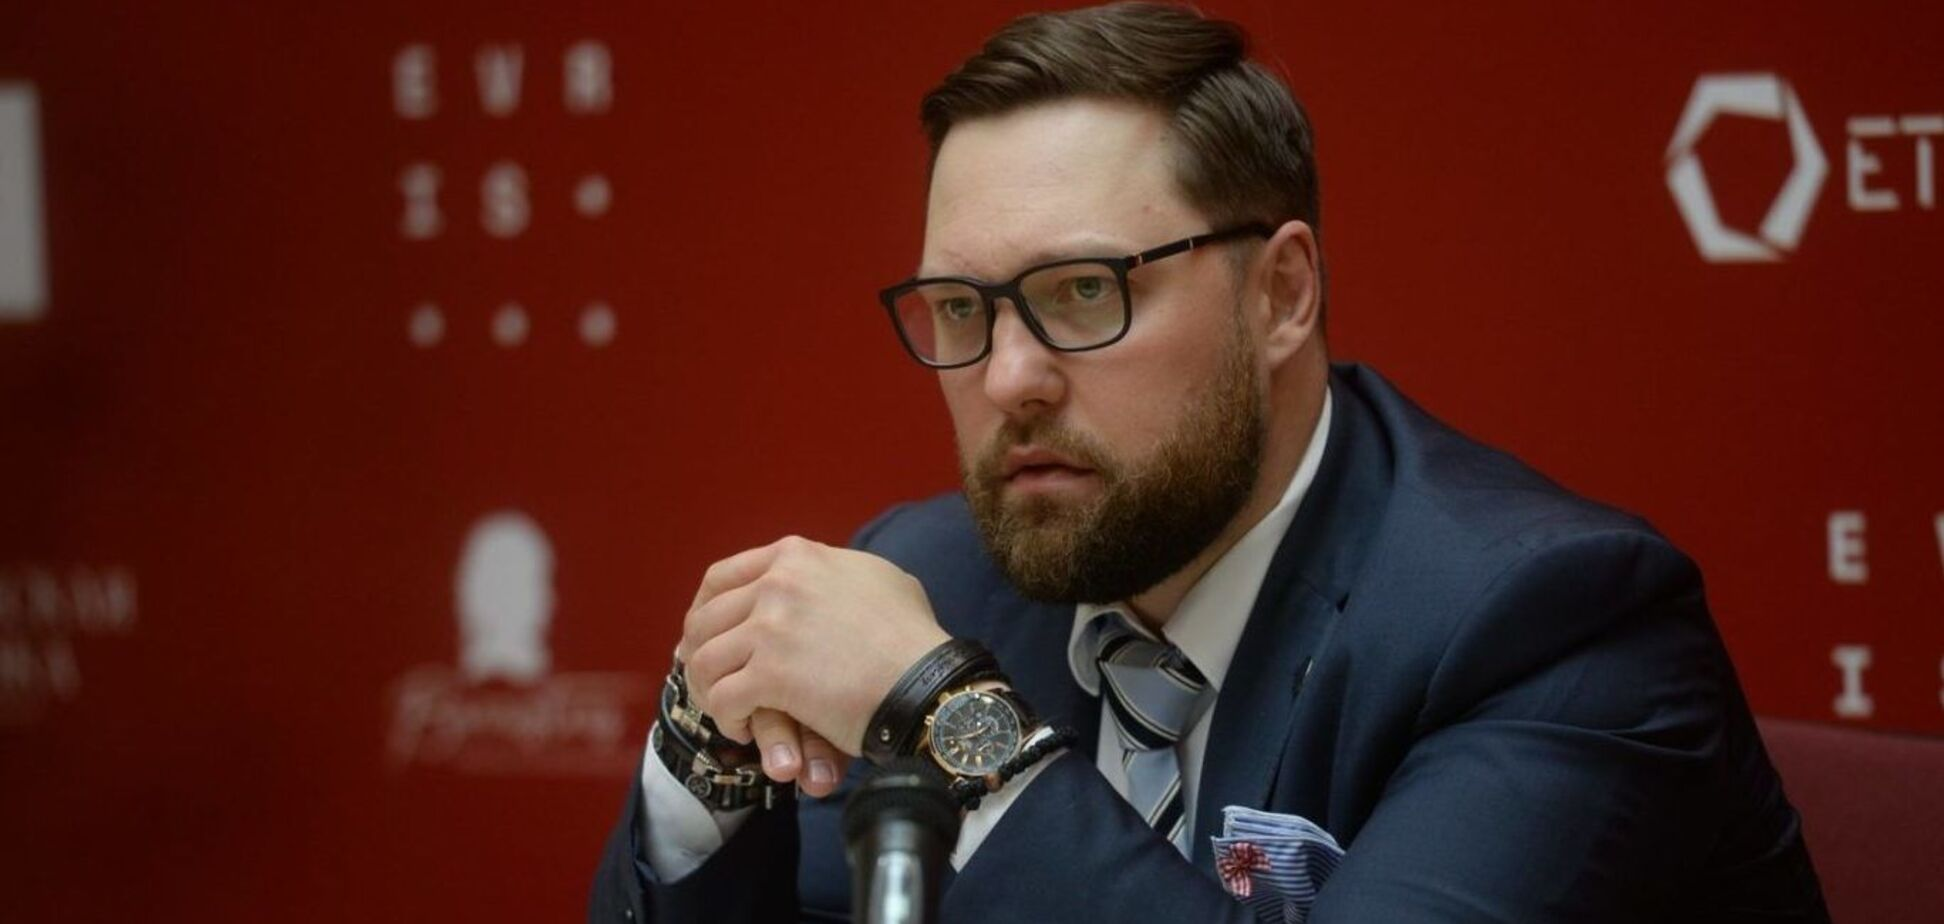 Радником мера Києва з правових питань призначено Олексія Шевчука